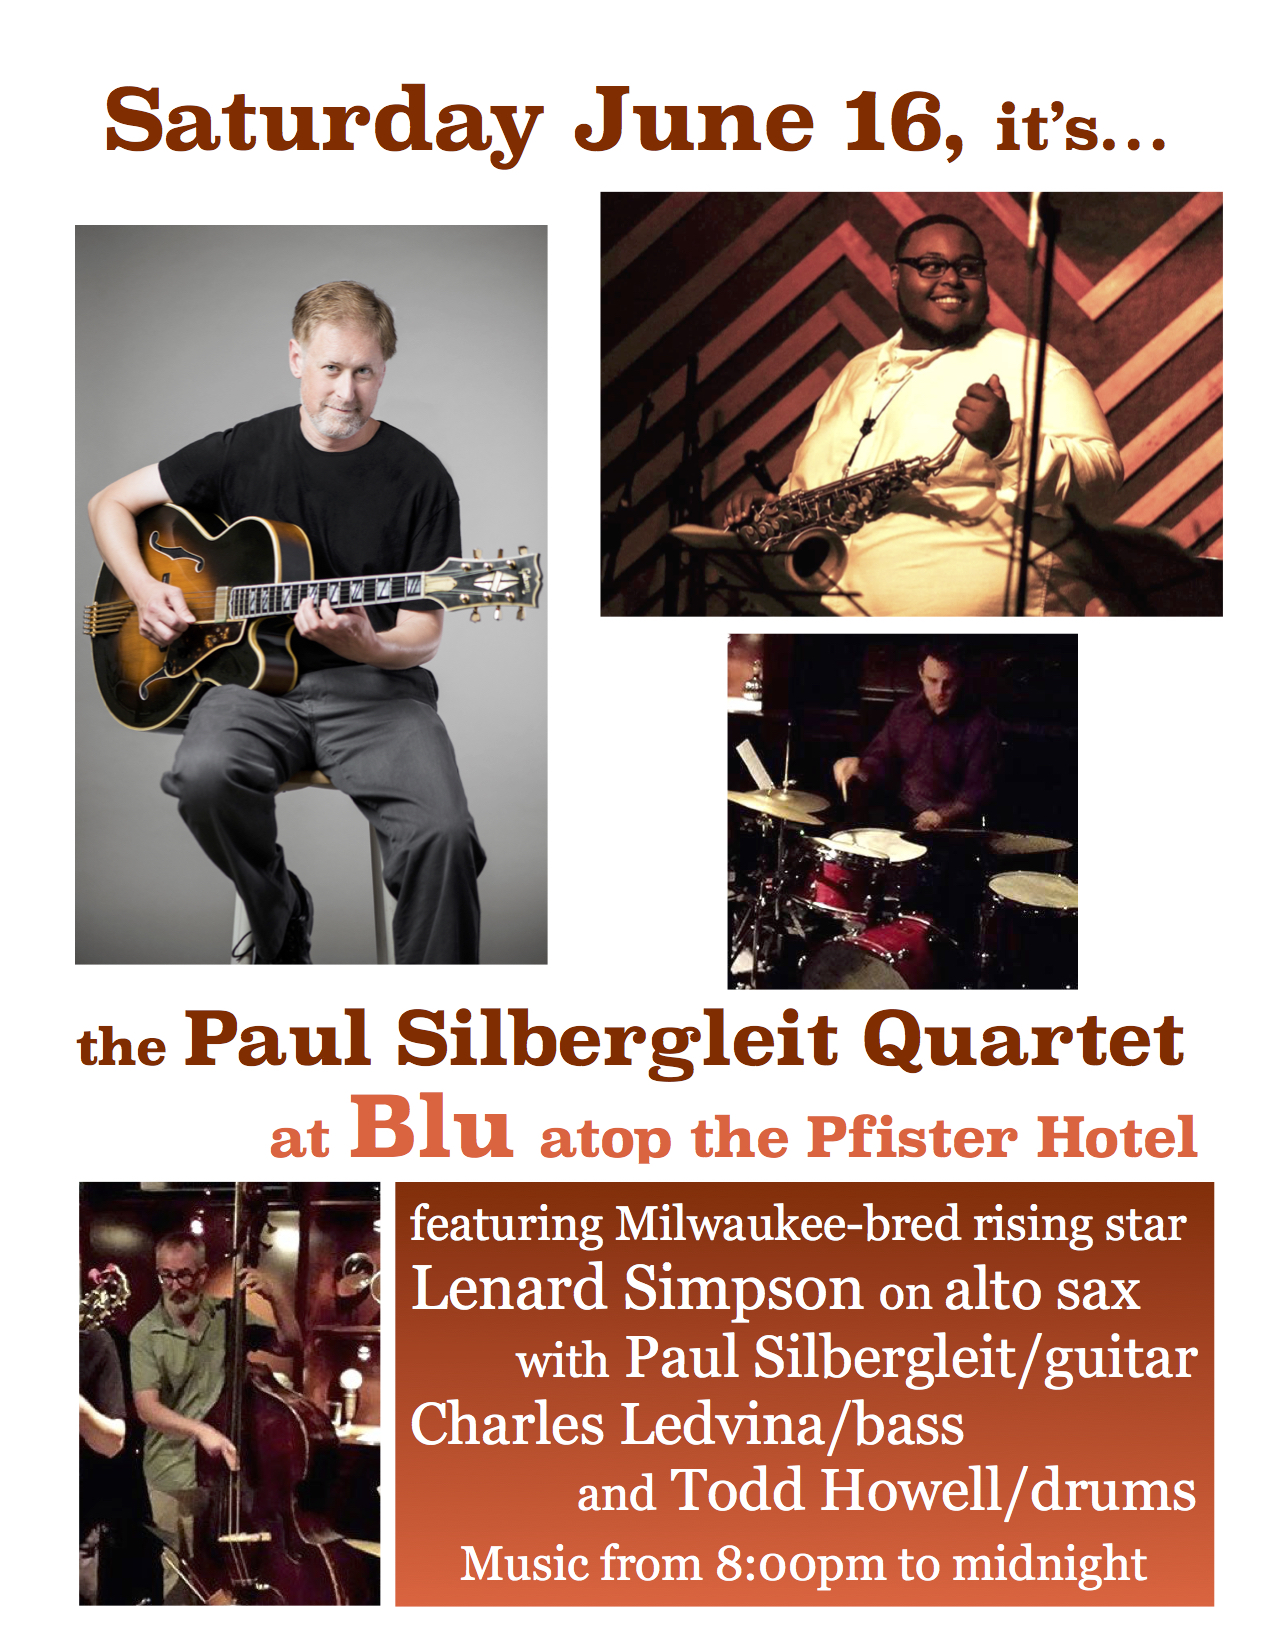 Paul Silbergleit Quartet at Blu, Pfister Hotel, Milwaukee, WI - Paul